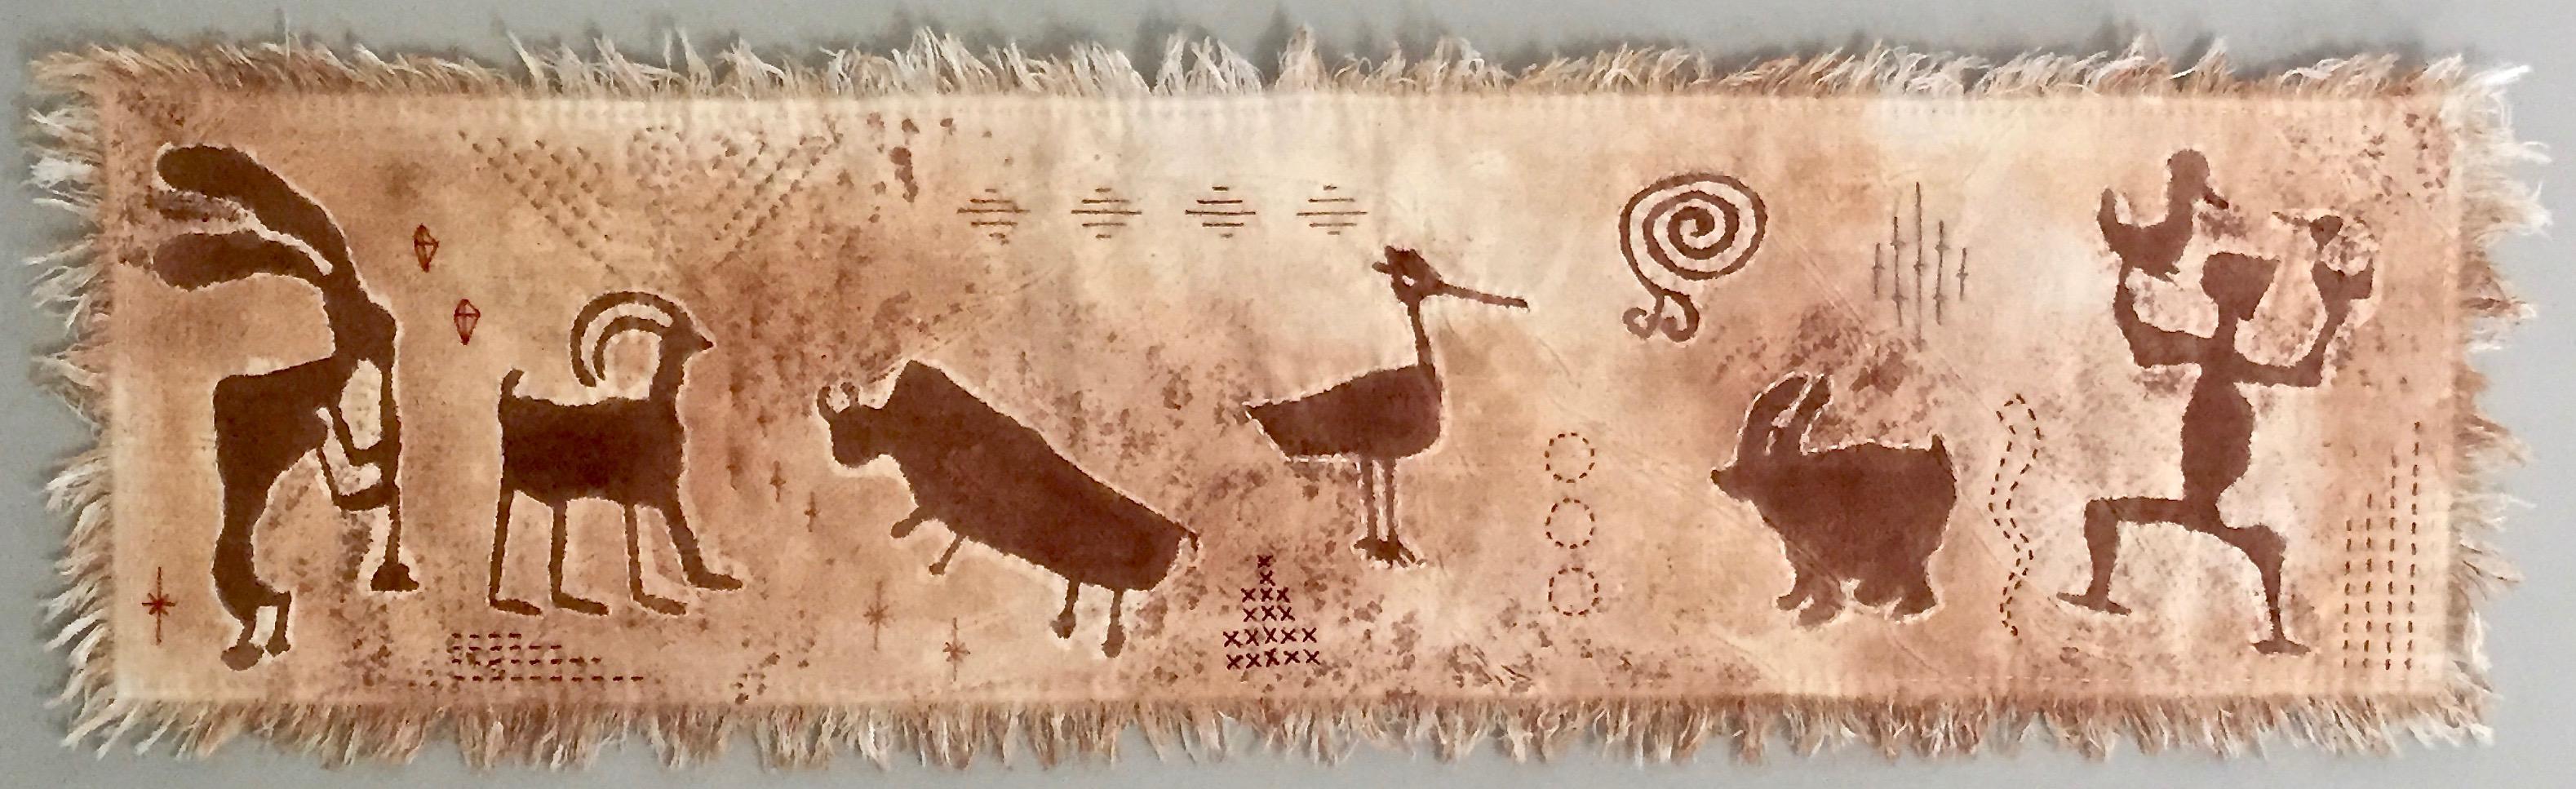 Petroglyphs II